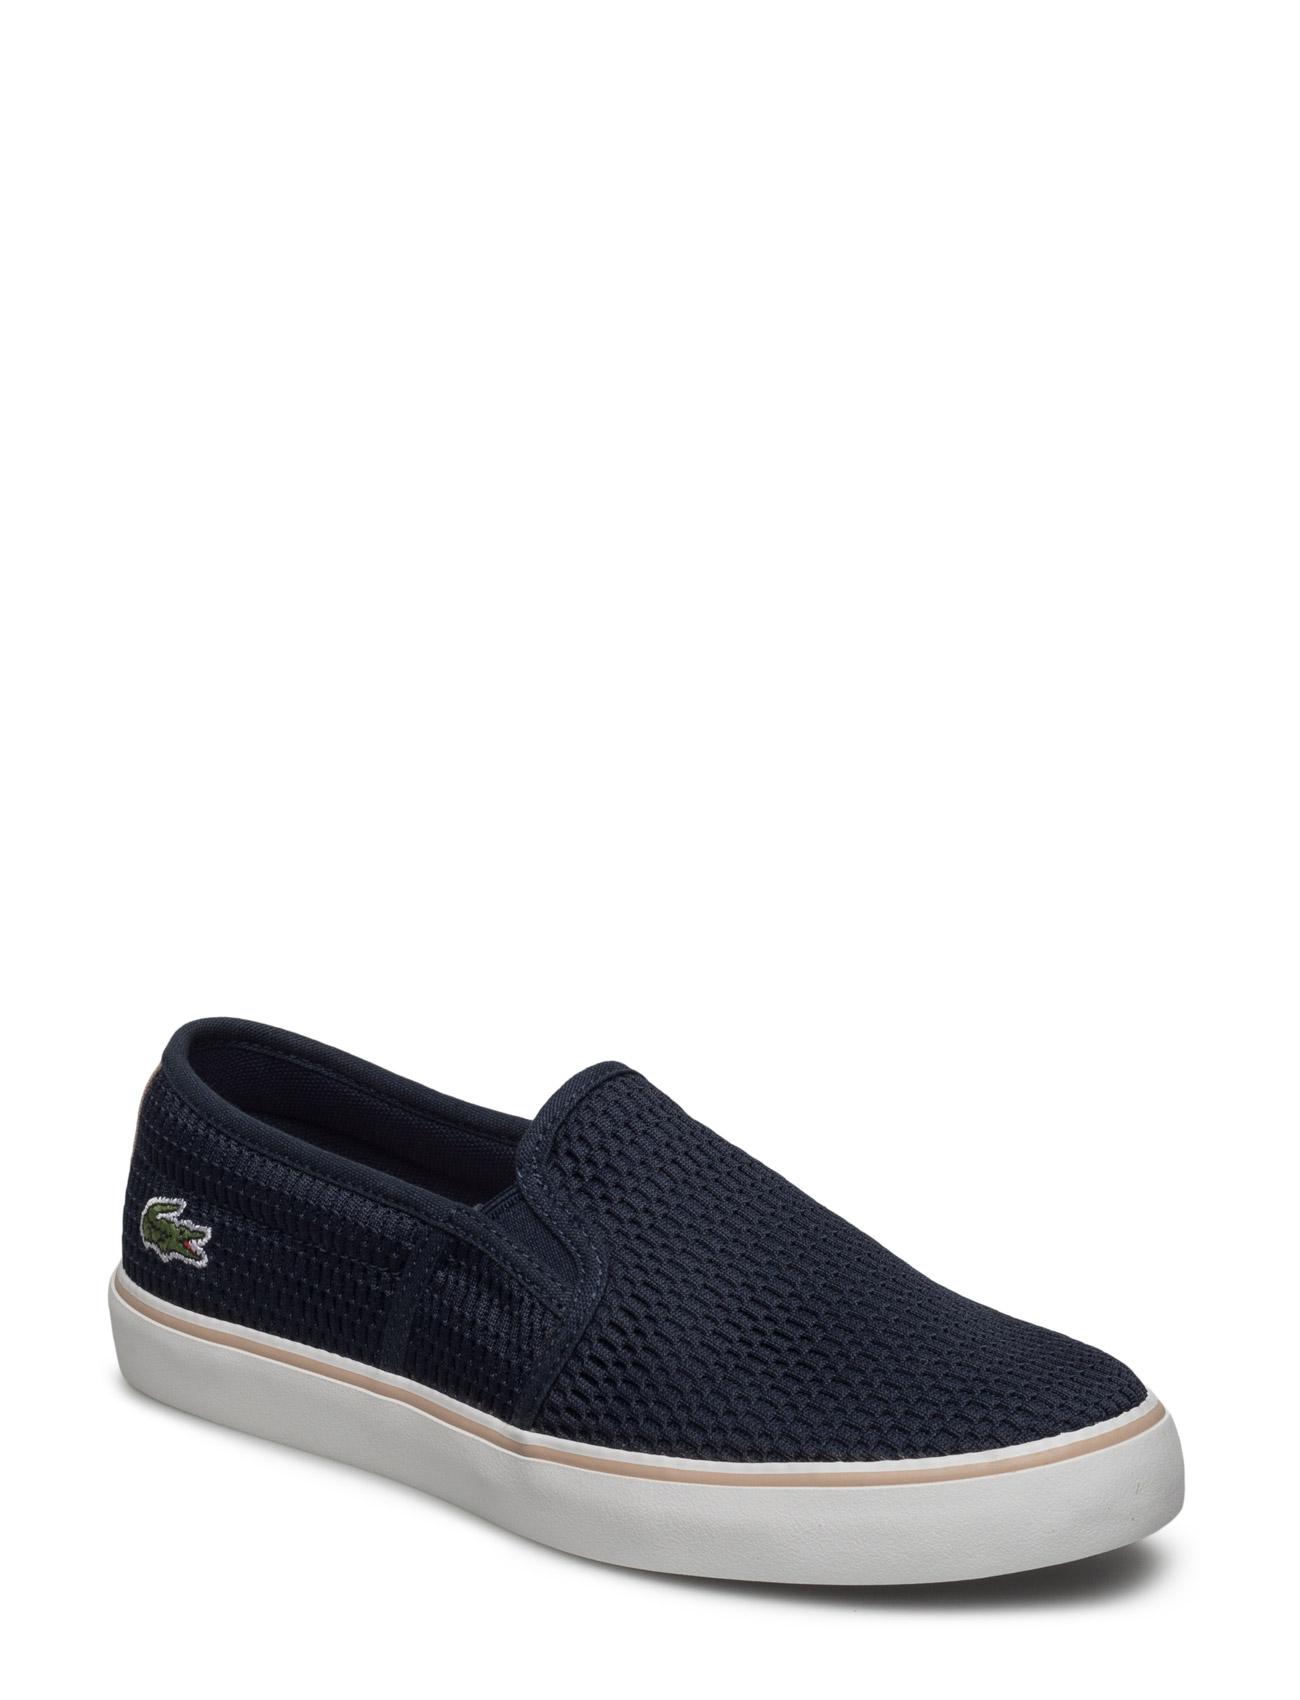 Gazon 217 1 Lacoste Shoes Sneakers til Damer i